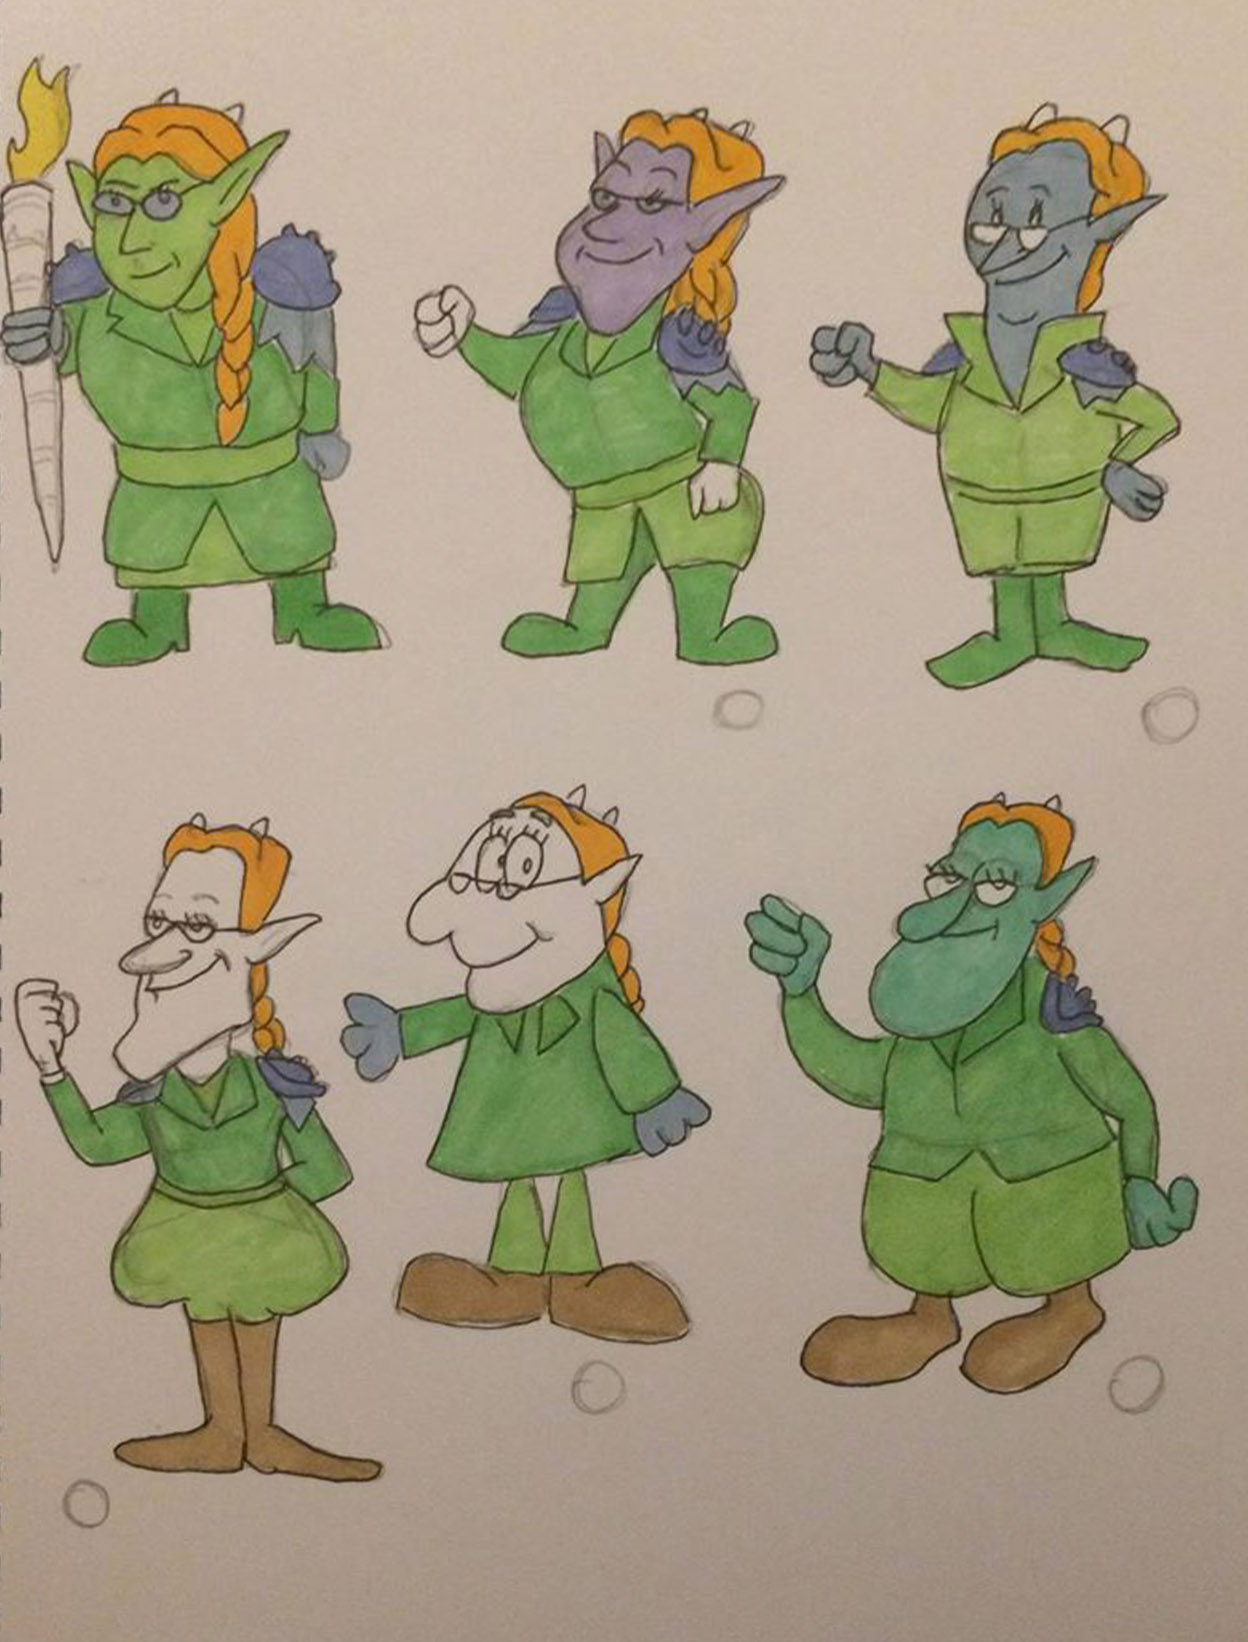 Yosti - character styles